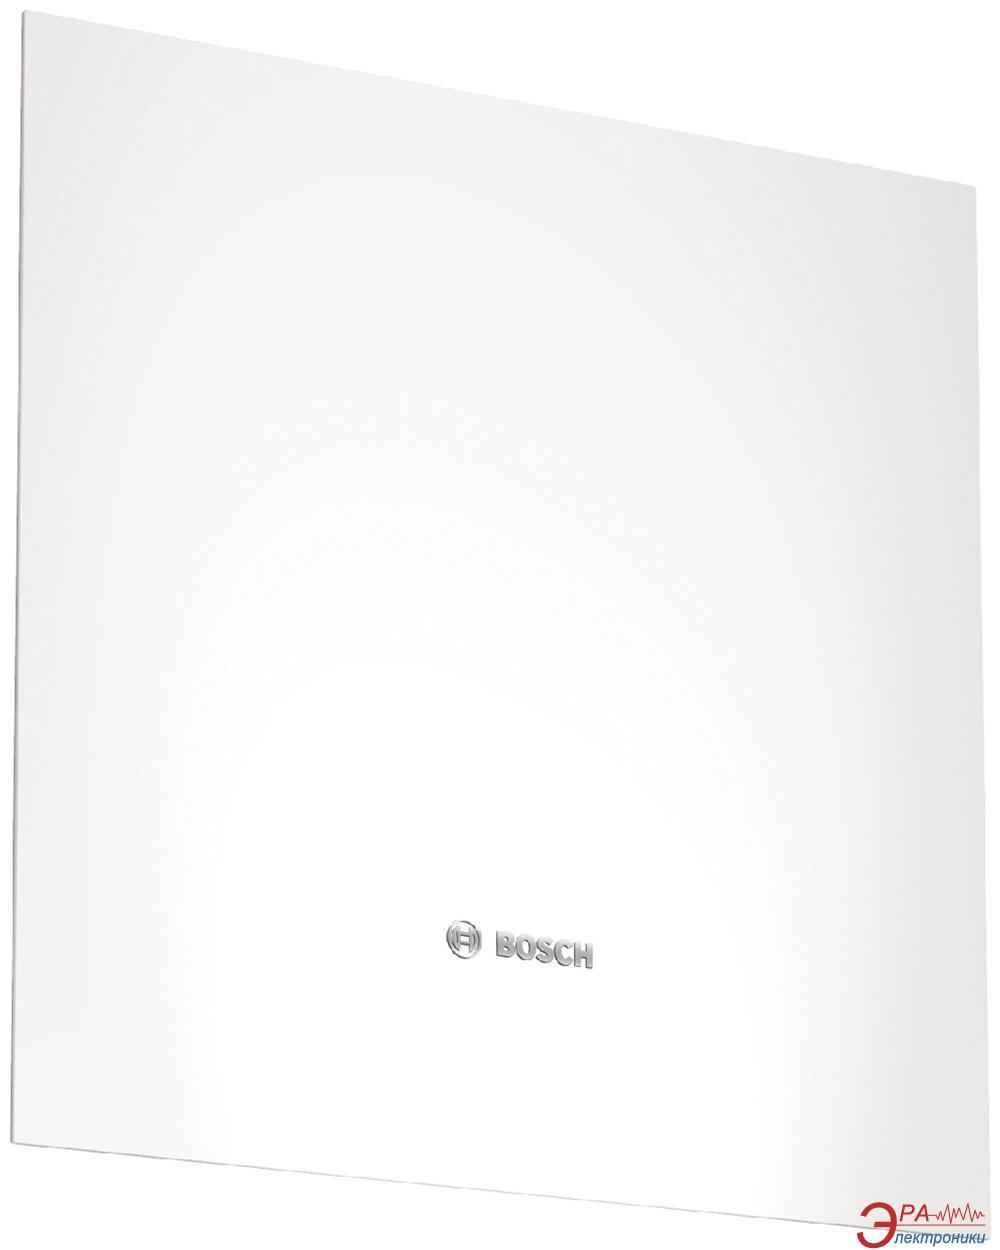 Декоративная панель Bosch DSZ 0620